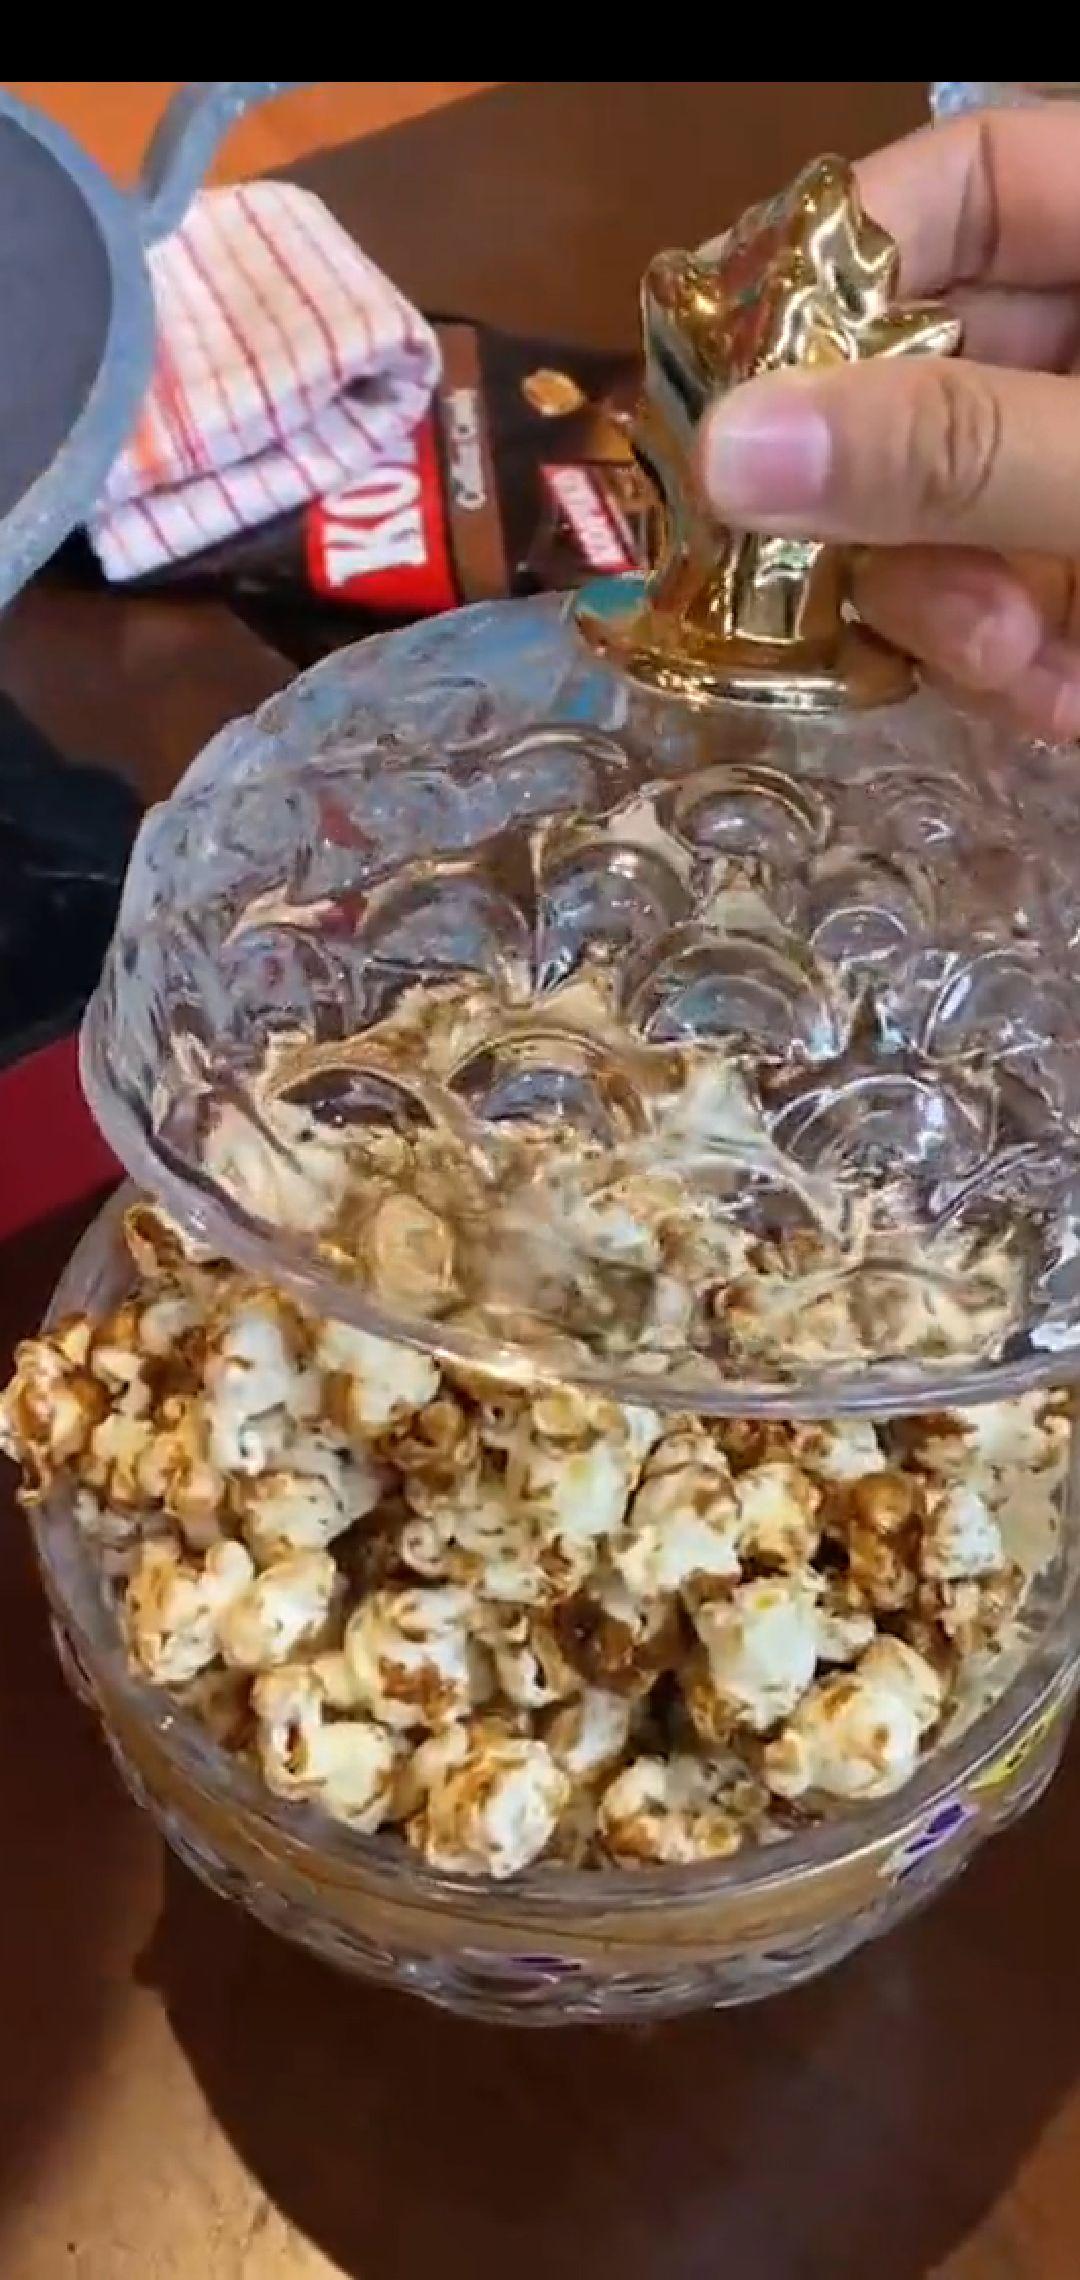 Chef Arnold Lelang Popcorn 'Emas' Buatannya, Laku Berapa?